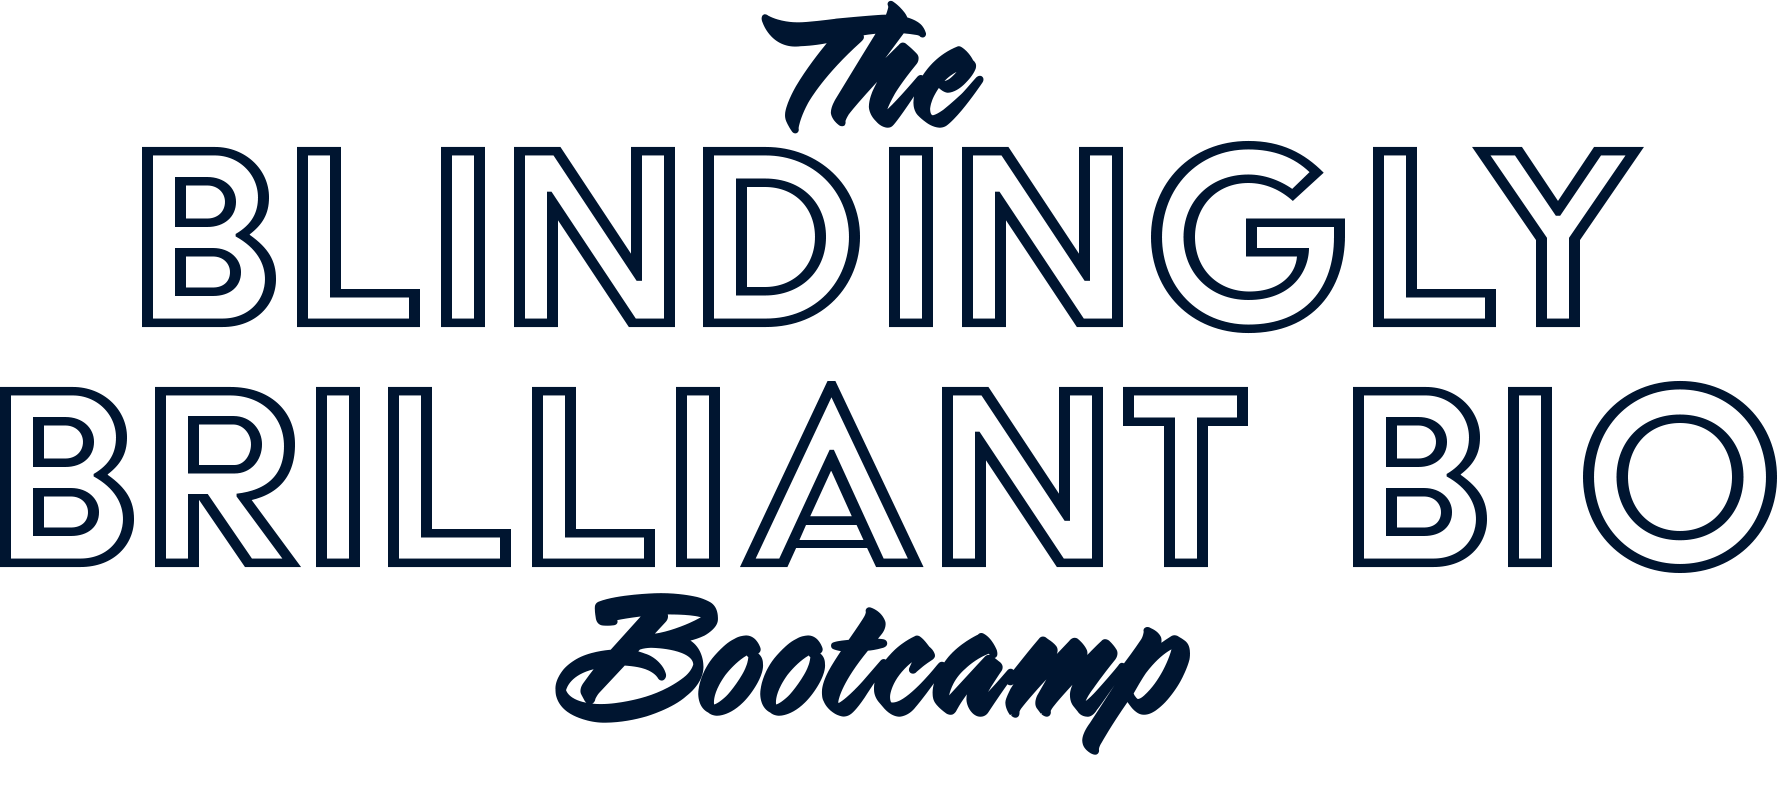 Blindingly Brilliant Bio Bootcamp